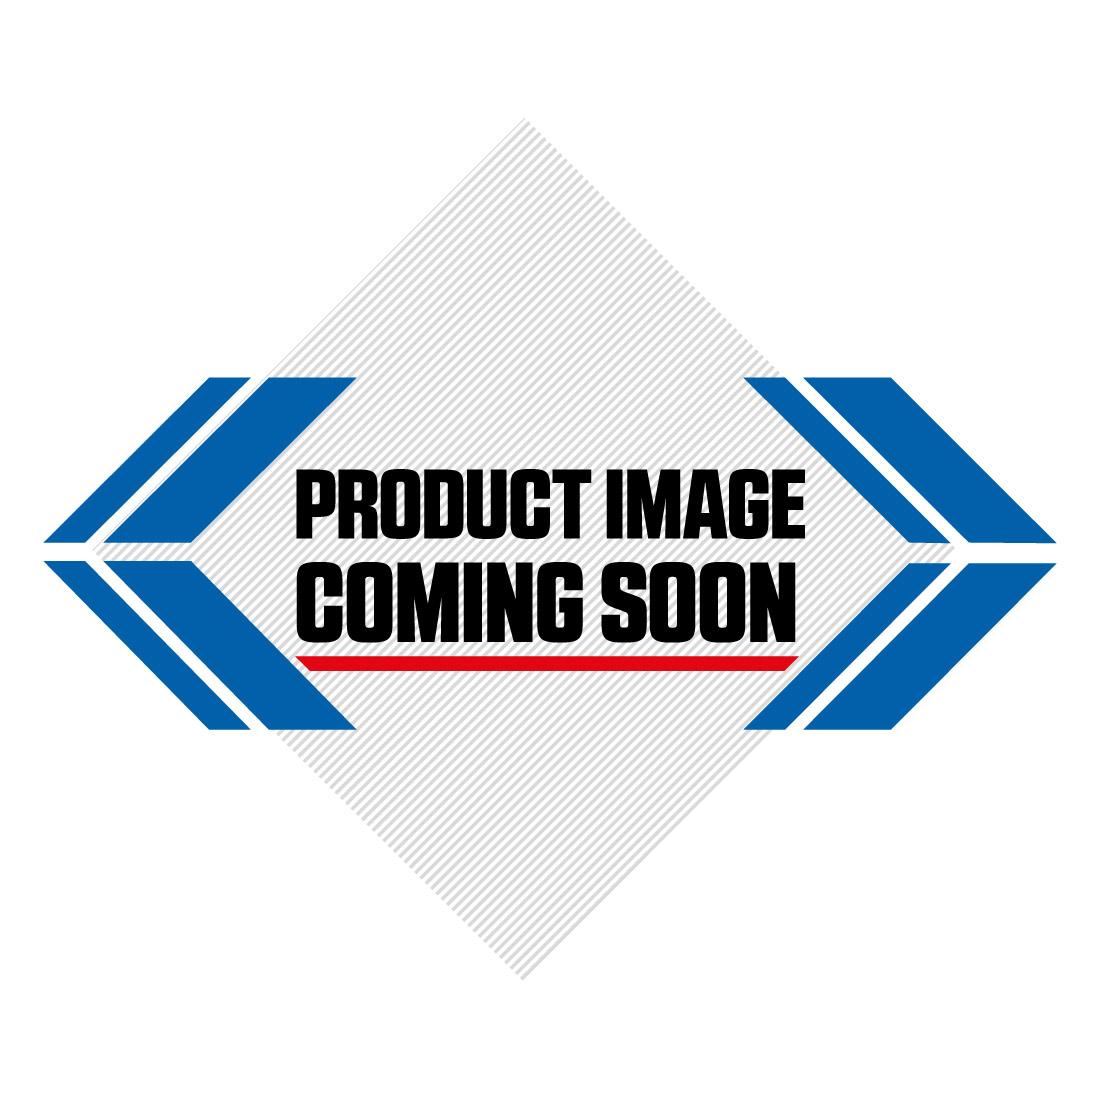 Silkolene Comp 4 10w-40 XP Ester Based Semi Synthetic Bike Engine Oil - 4 Cube Image-2